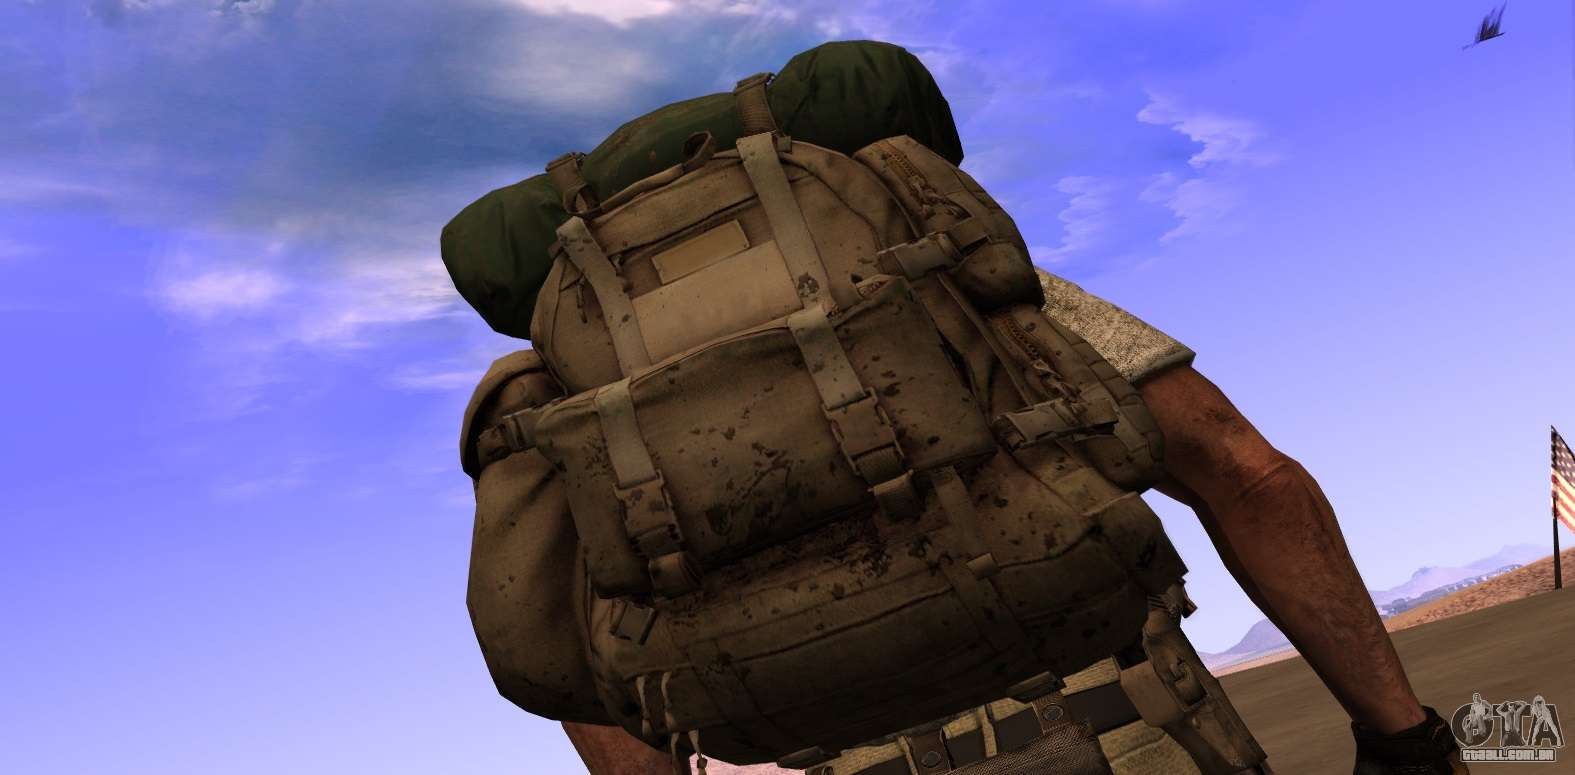 Скачать рюкзак для гта сан андреас рюкзак цена грн